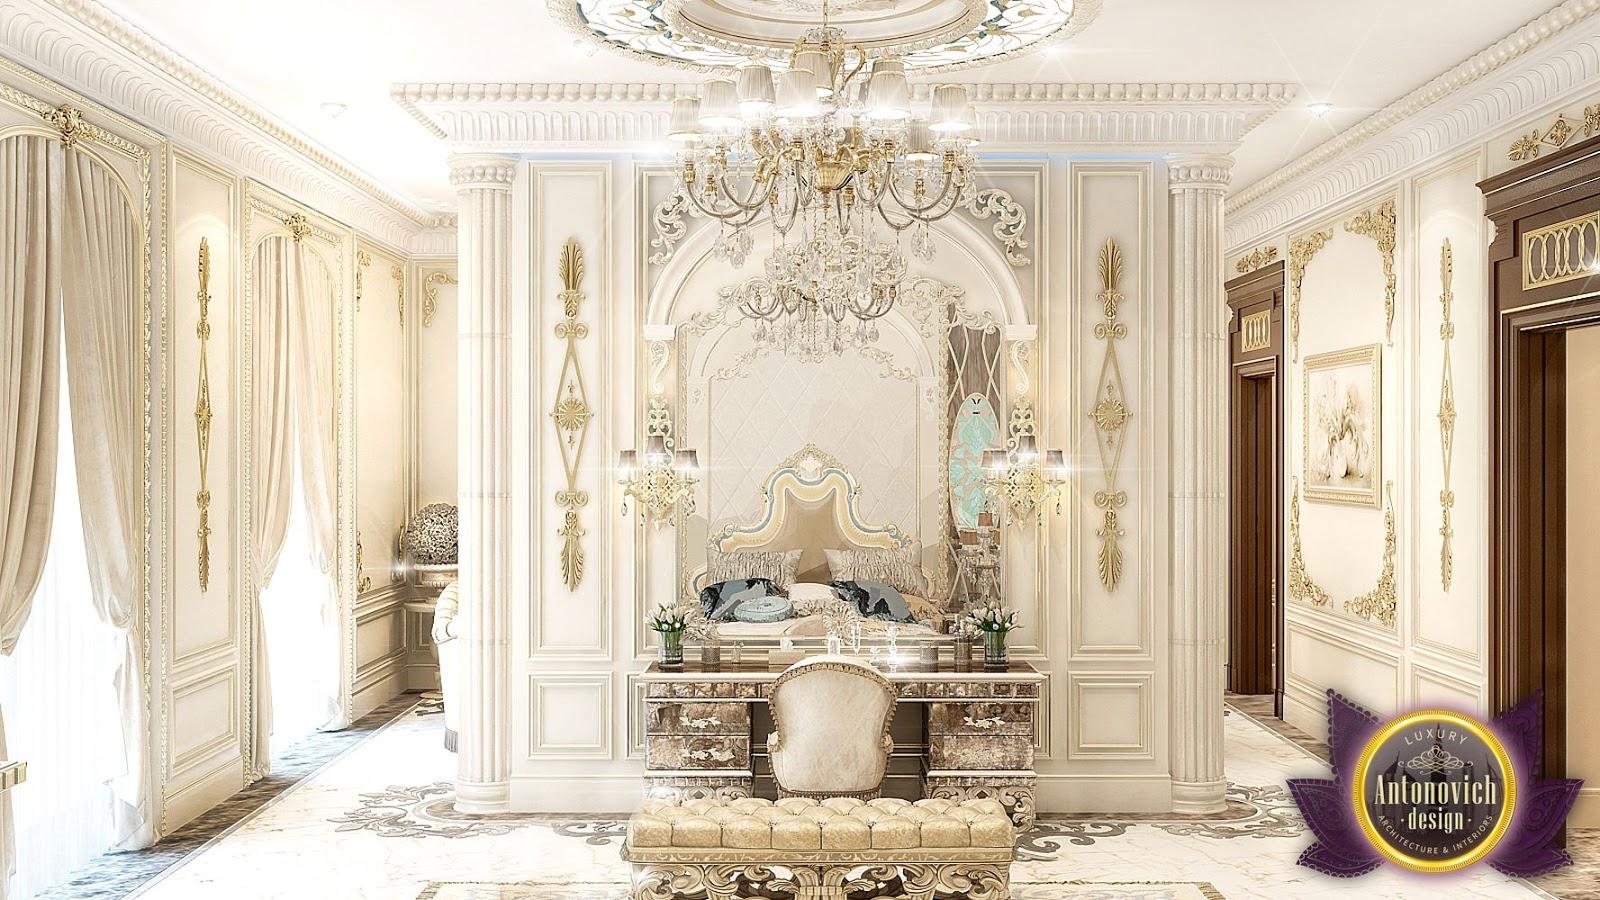 luxurious arabic style bedroom LUXURY ANTONOVICH DESIGN UAE: Luxury Royal Arabic Master Bedroom of Luxury Antonovich Design